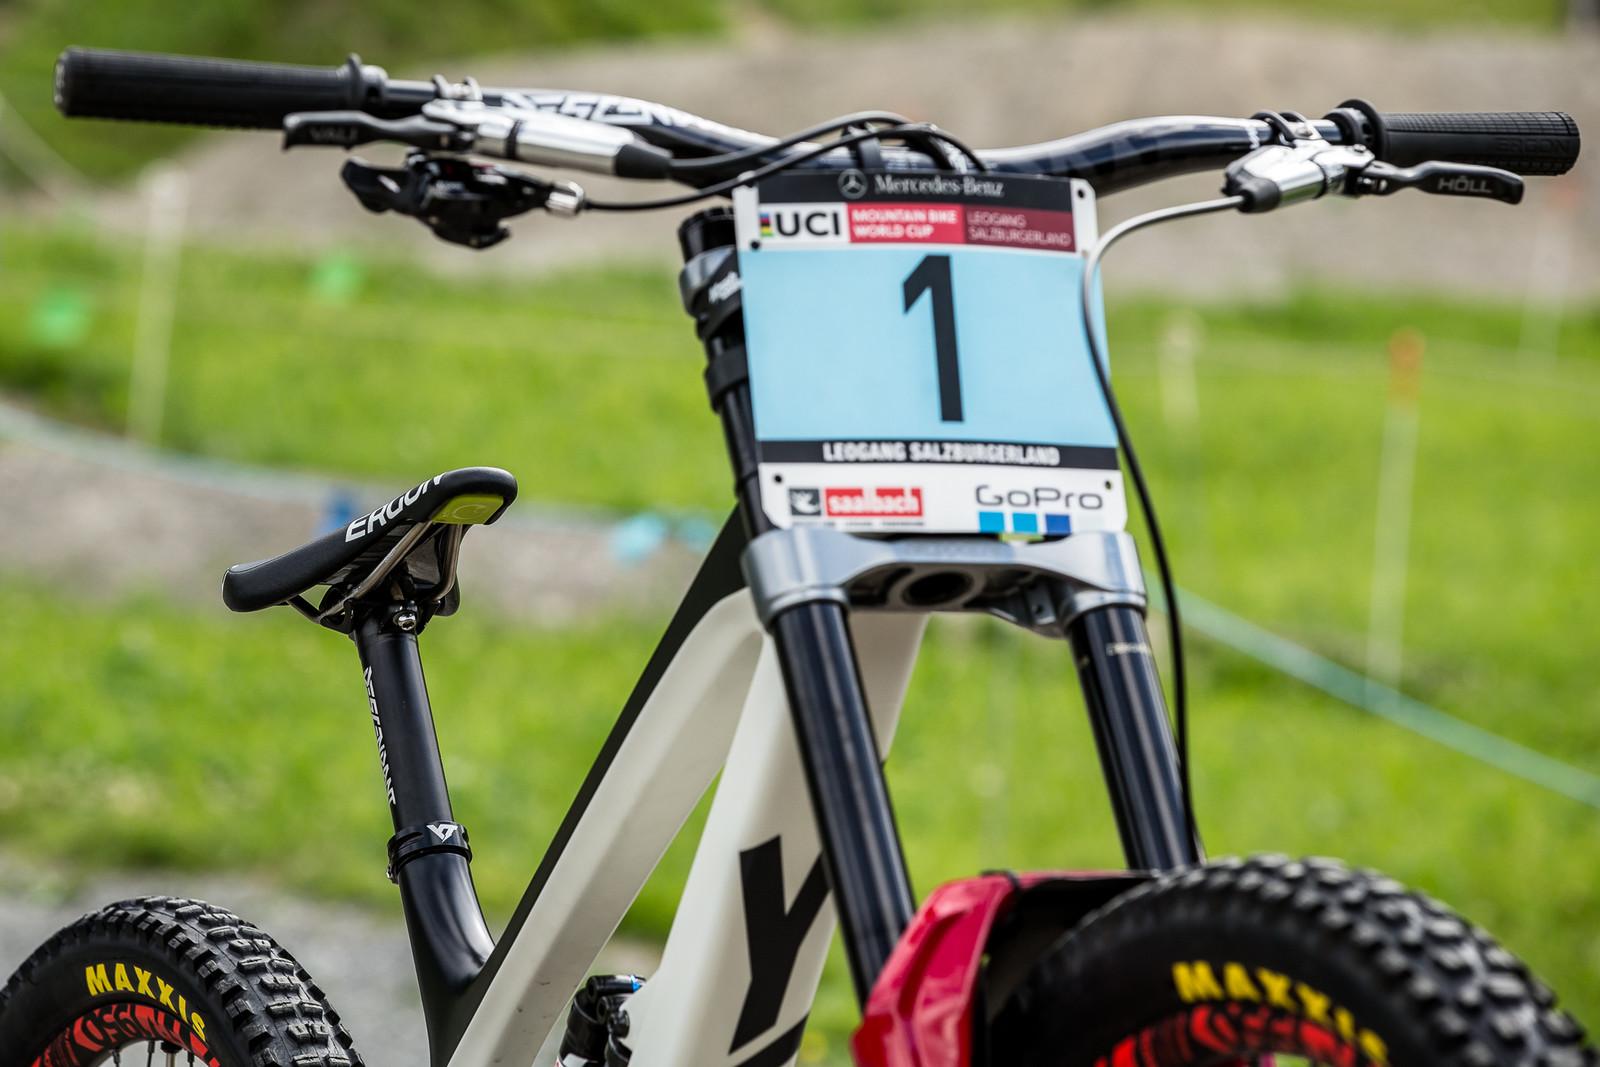 She's Got A Stranglehold on that #1 Plate - WINNING BIKE - Vali Höll's YT TUES - Mountain Biking Pictures - Vital MTB